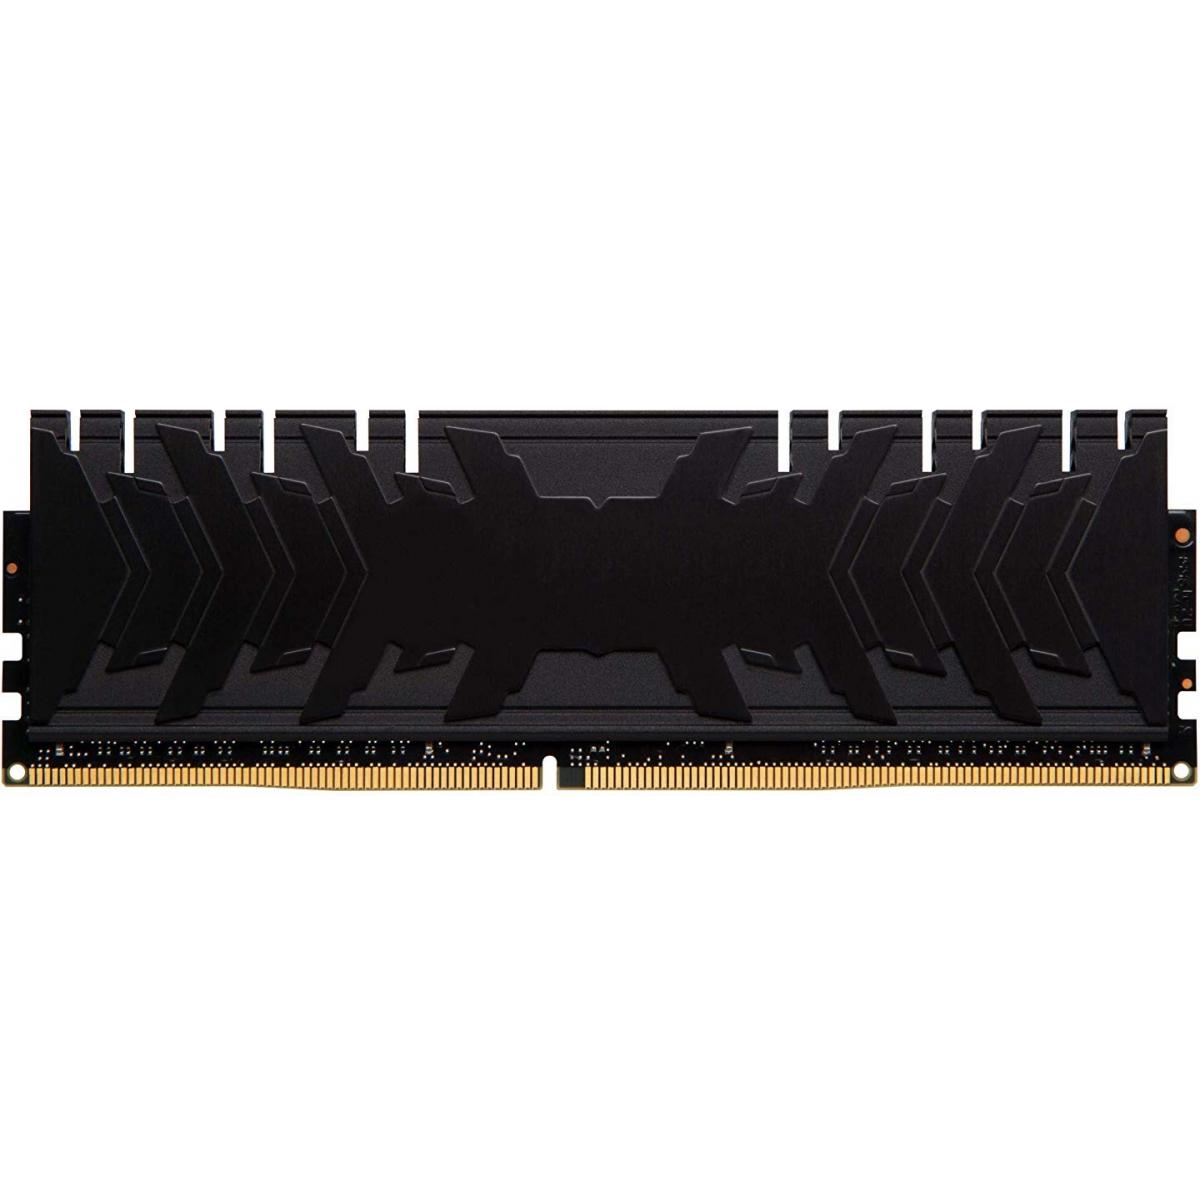 Memória DDR4 Kingston HyperX Predator, 16GB 2400MHZ, HX424C12PB3/16